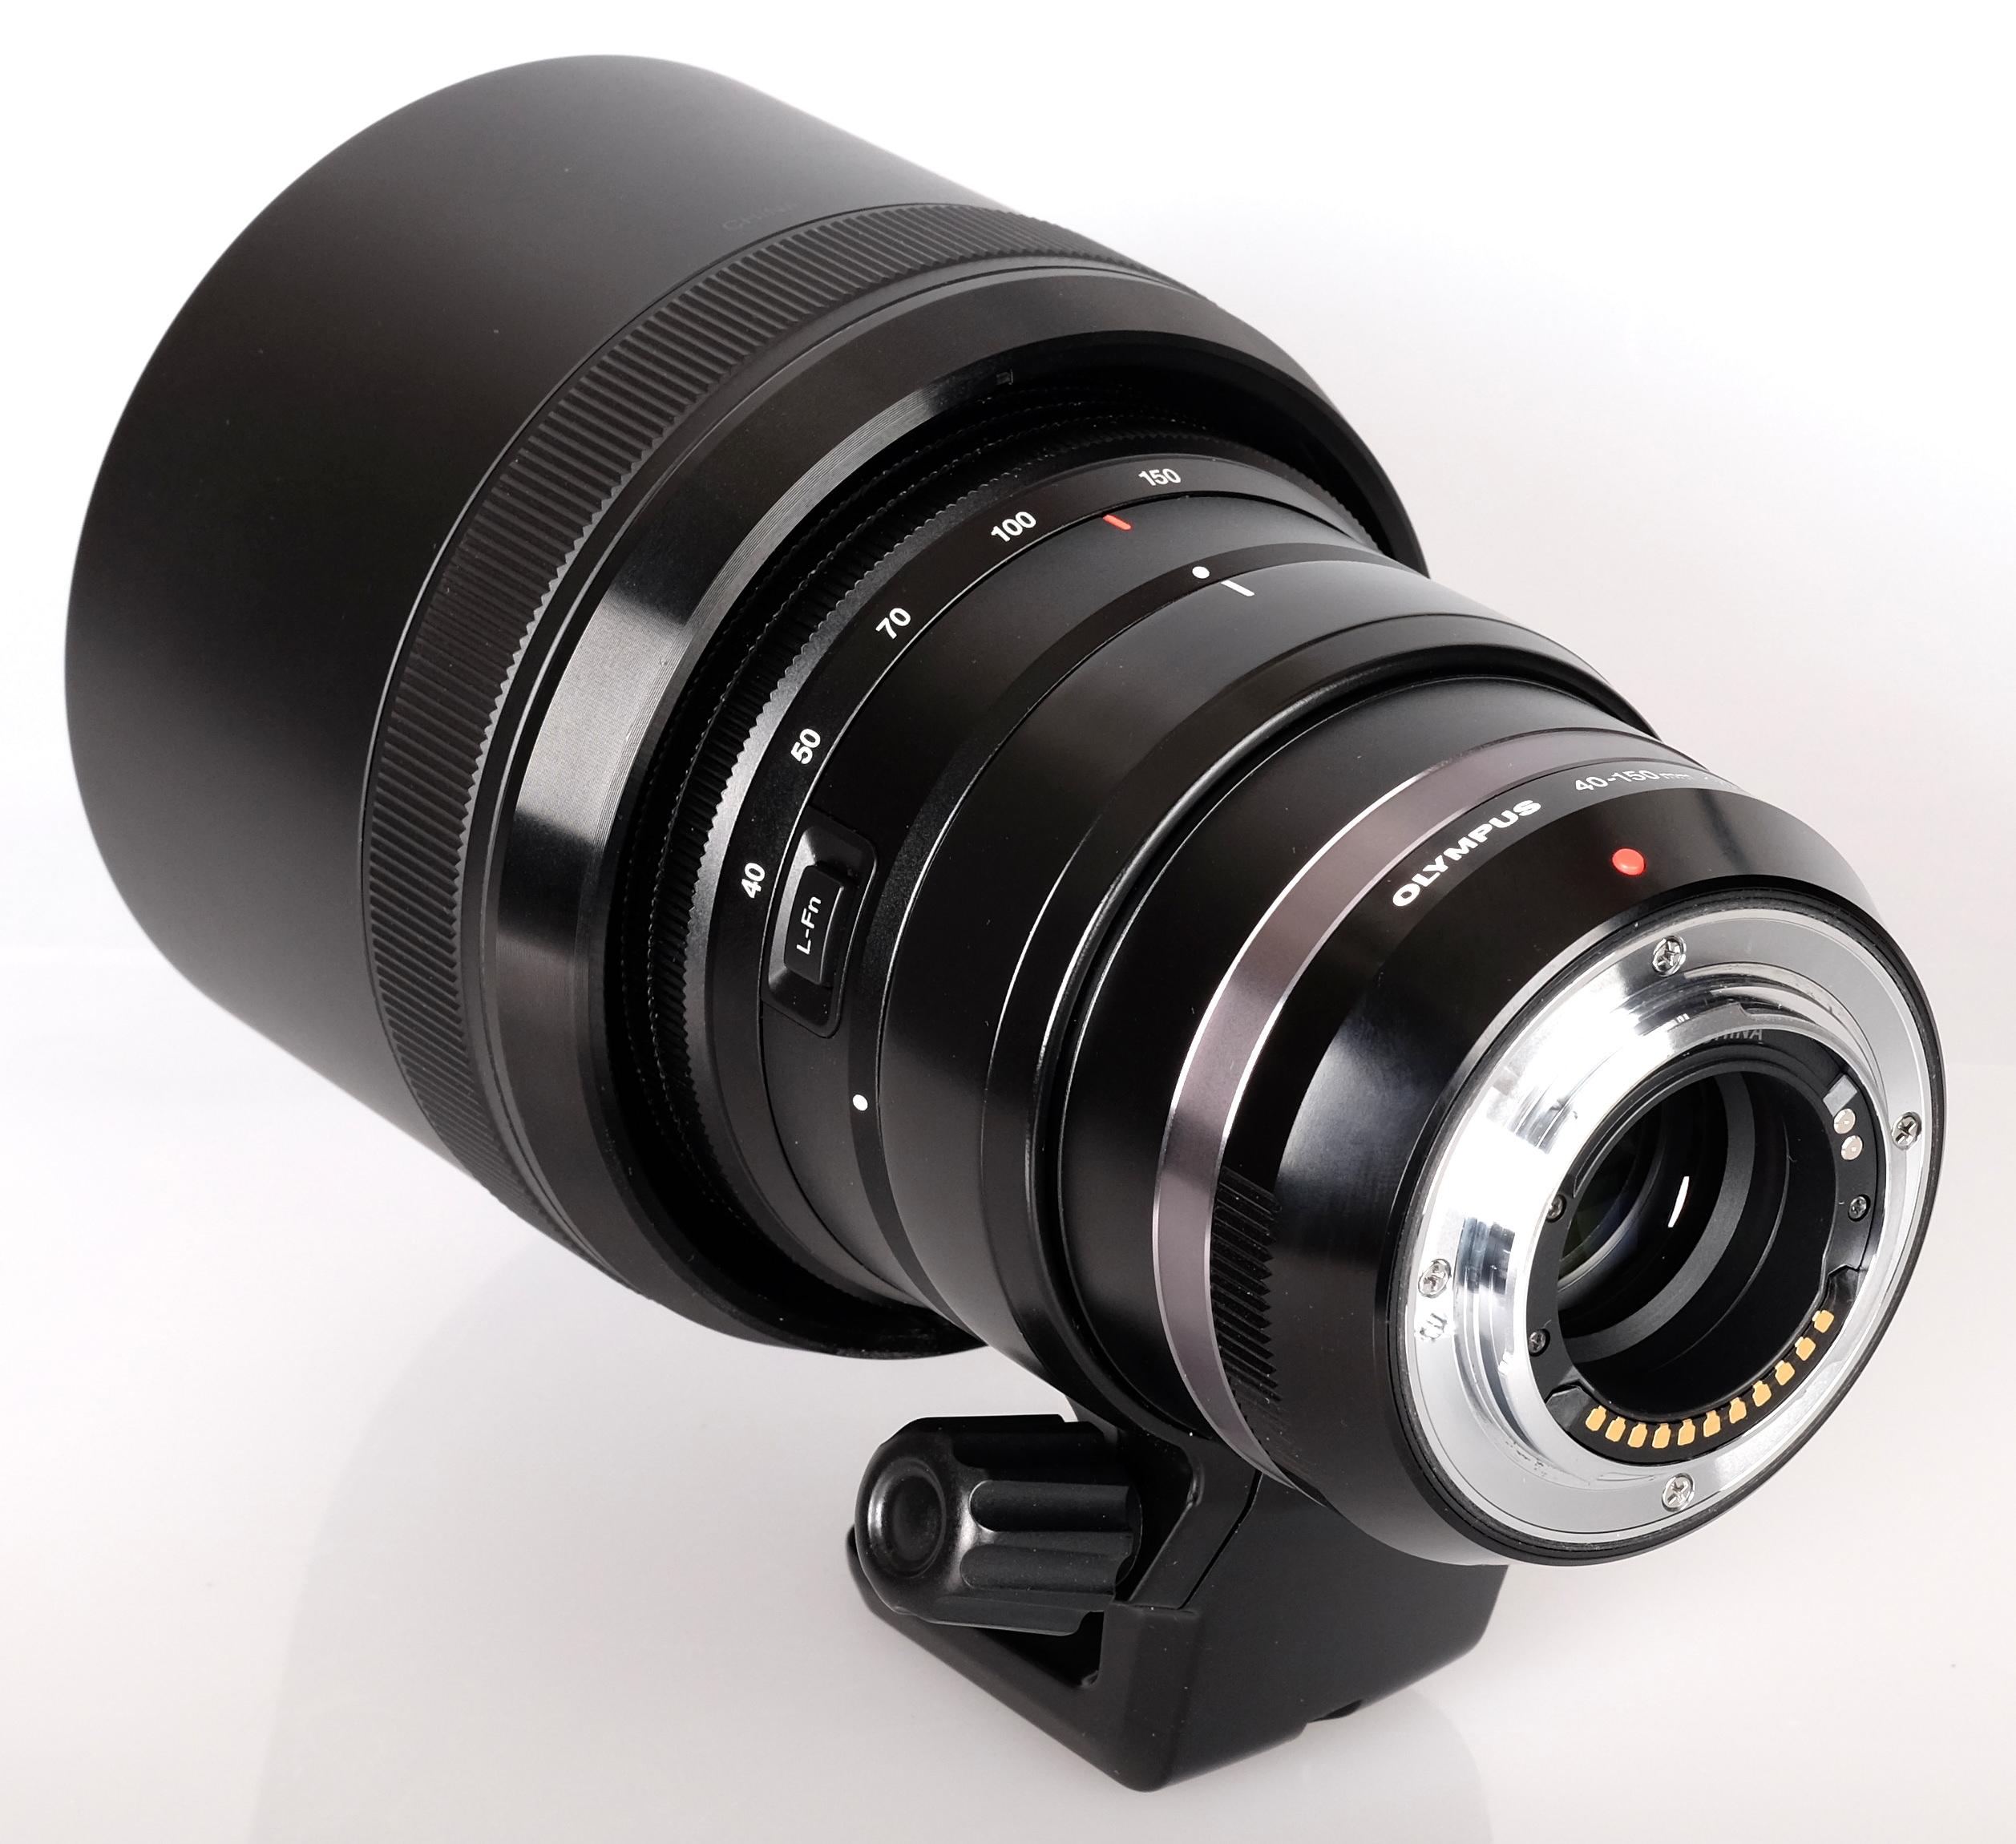 Olympus Digital Camera M.ZUIKO DIGITAL ED 40-150mm F2.8 PRO Lens Treiber Windows XP